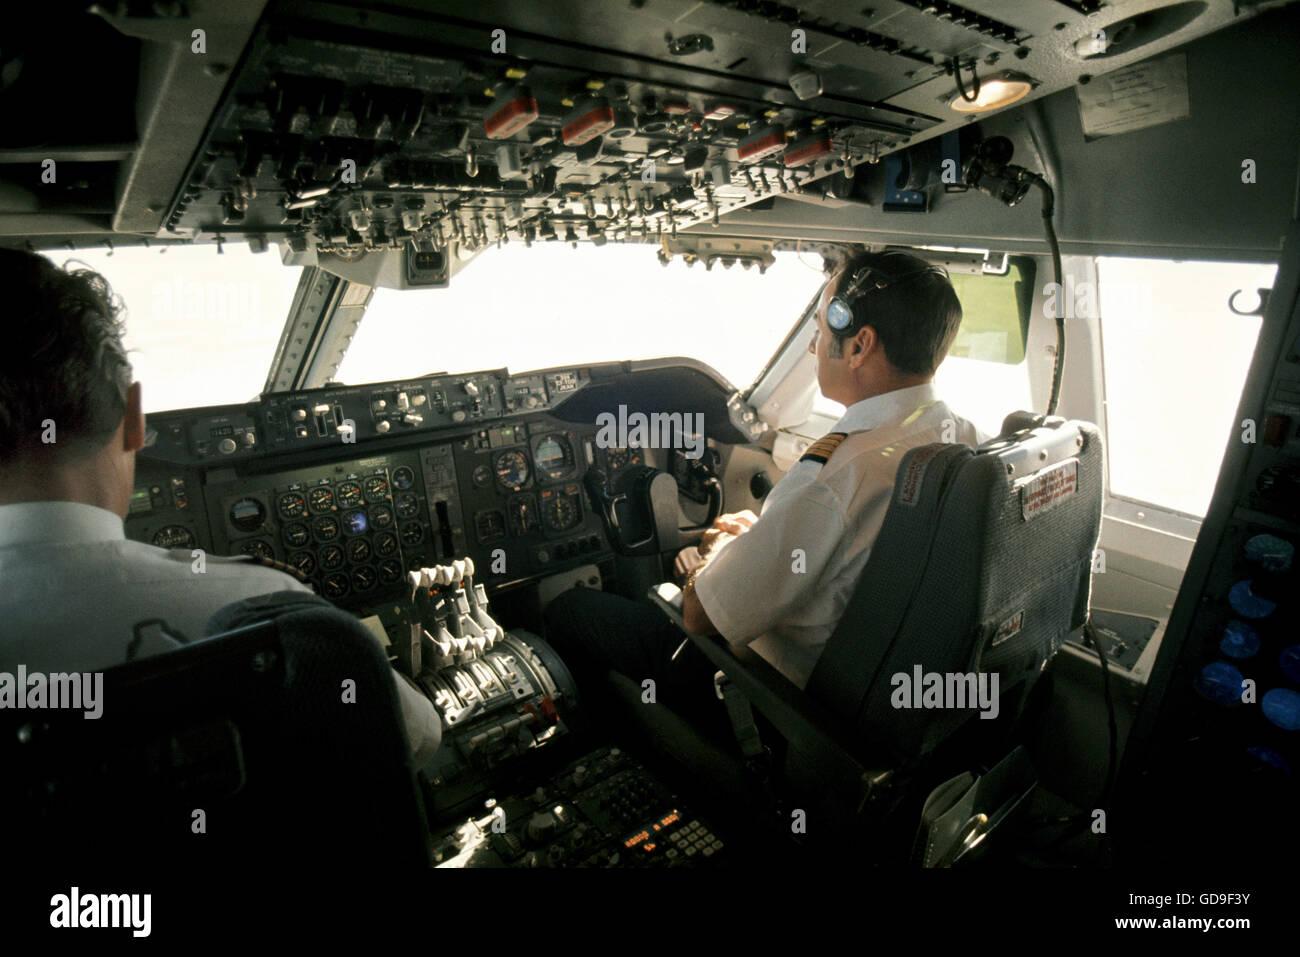 lintrieur dun boeing 747 de pilotage